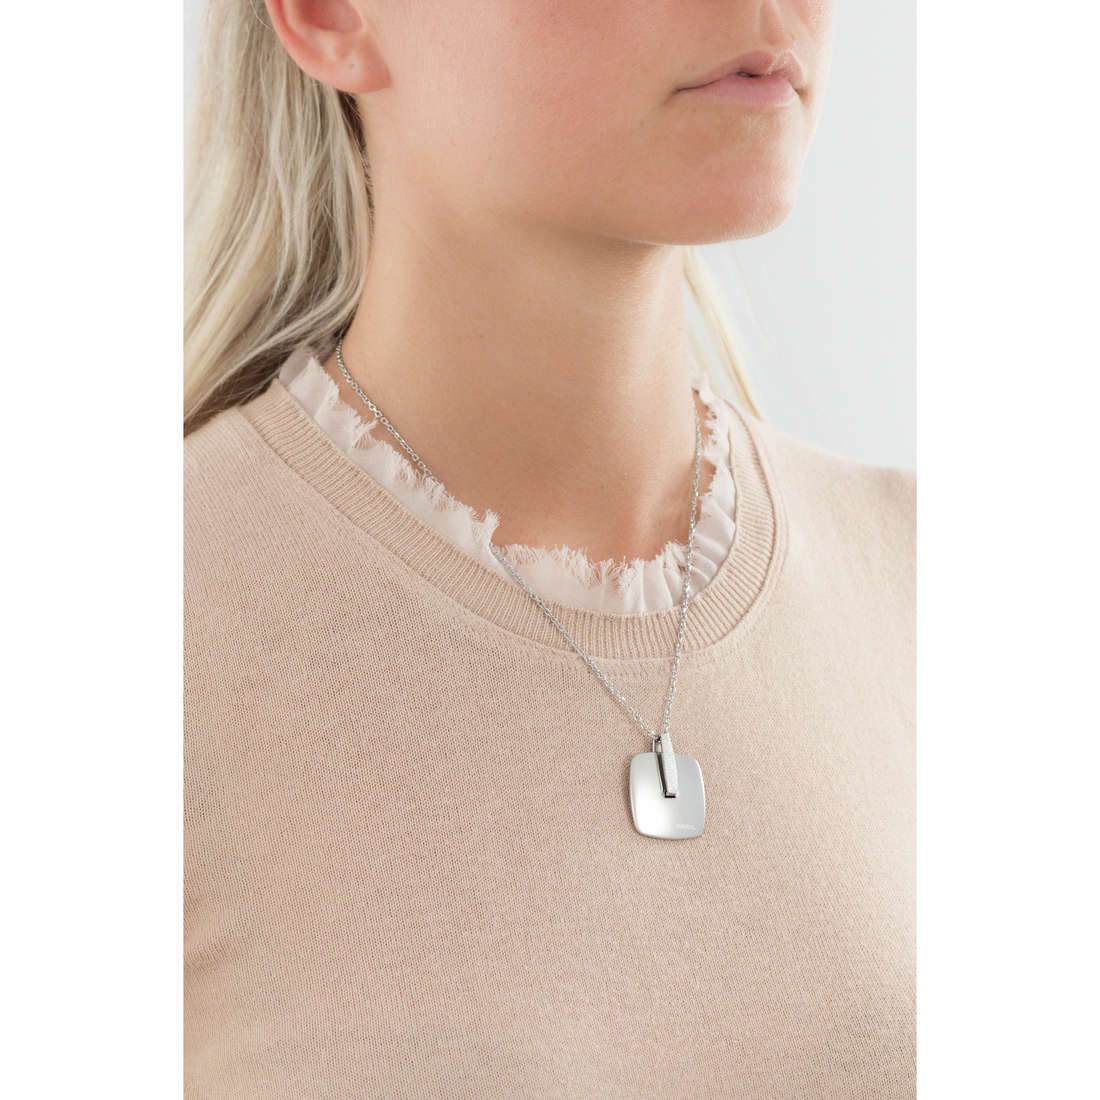 Breil necklaces New Blast woman TJ1605 indosso